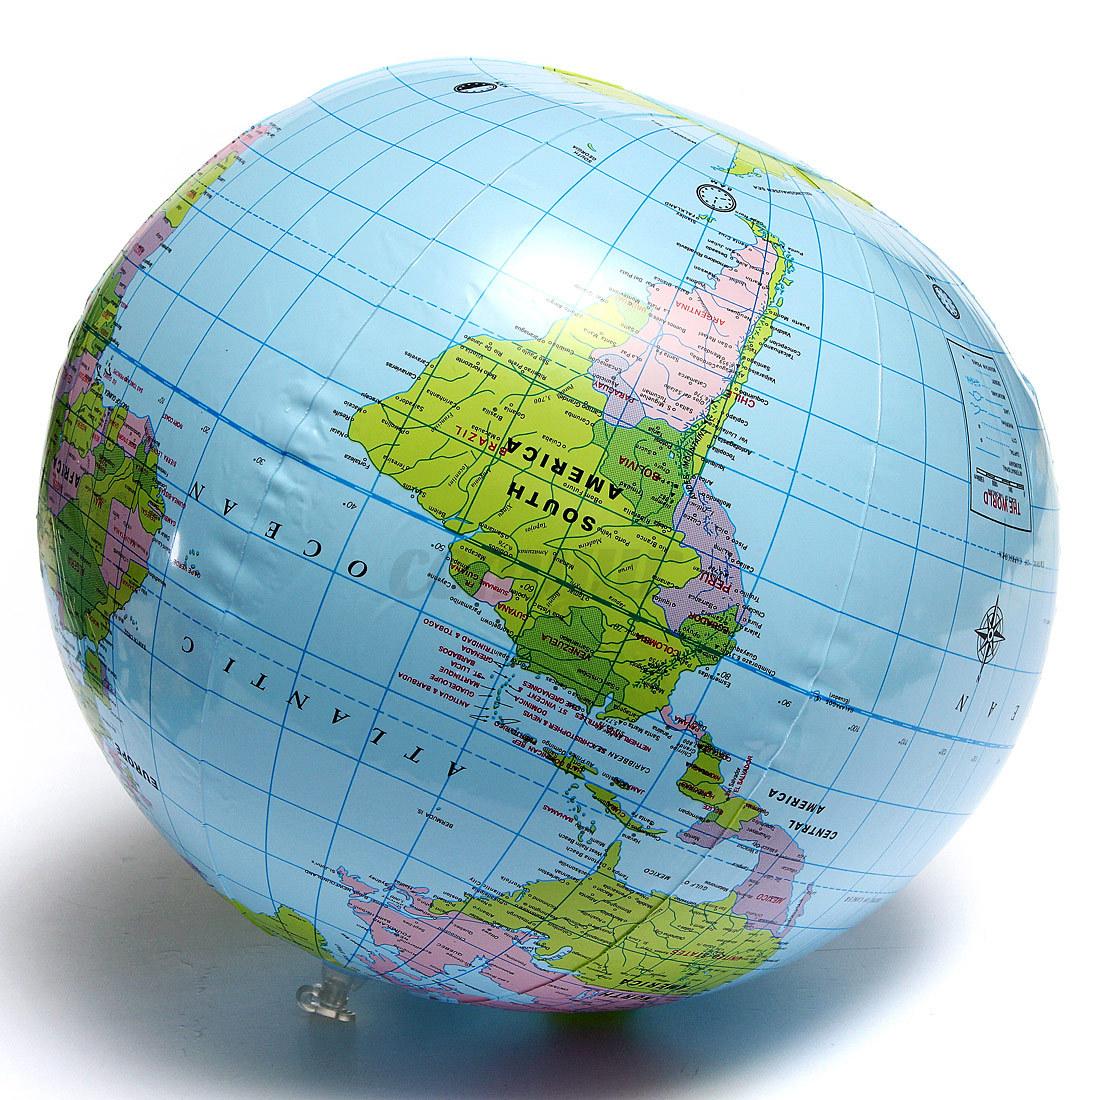 38cm inflatable earth world globe map beach ball